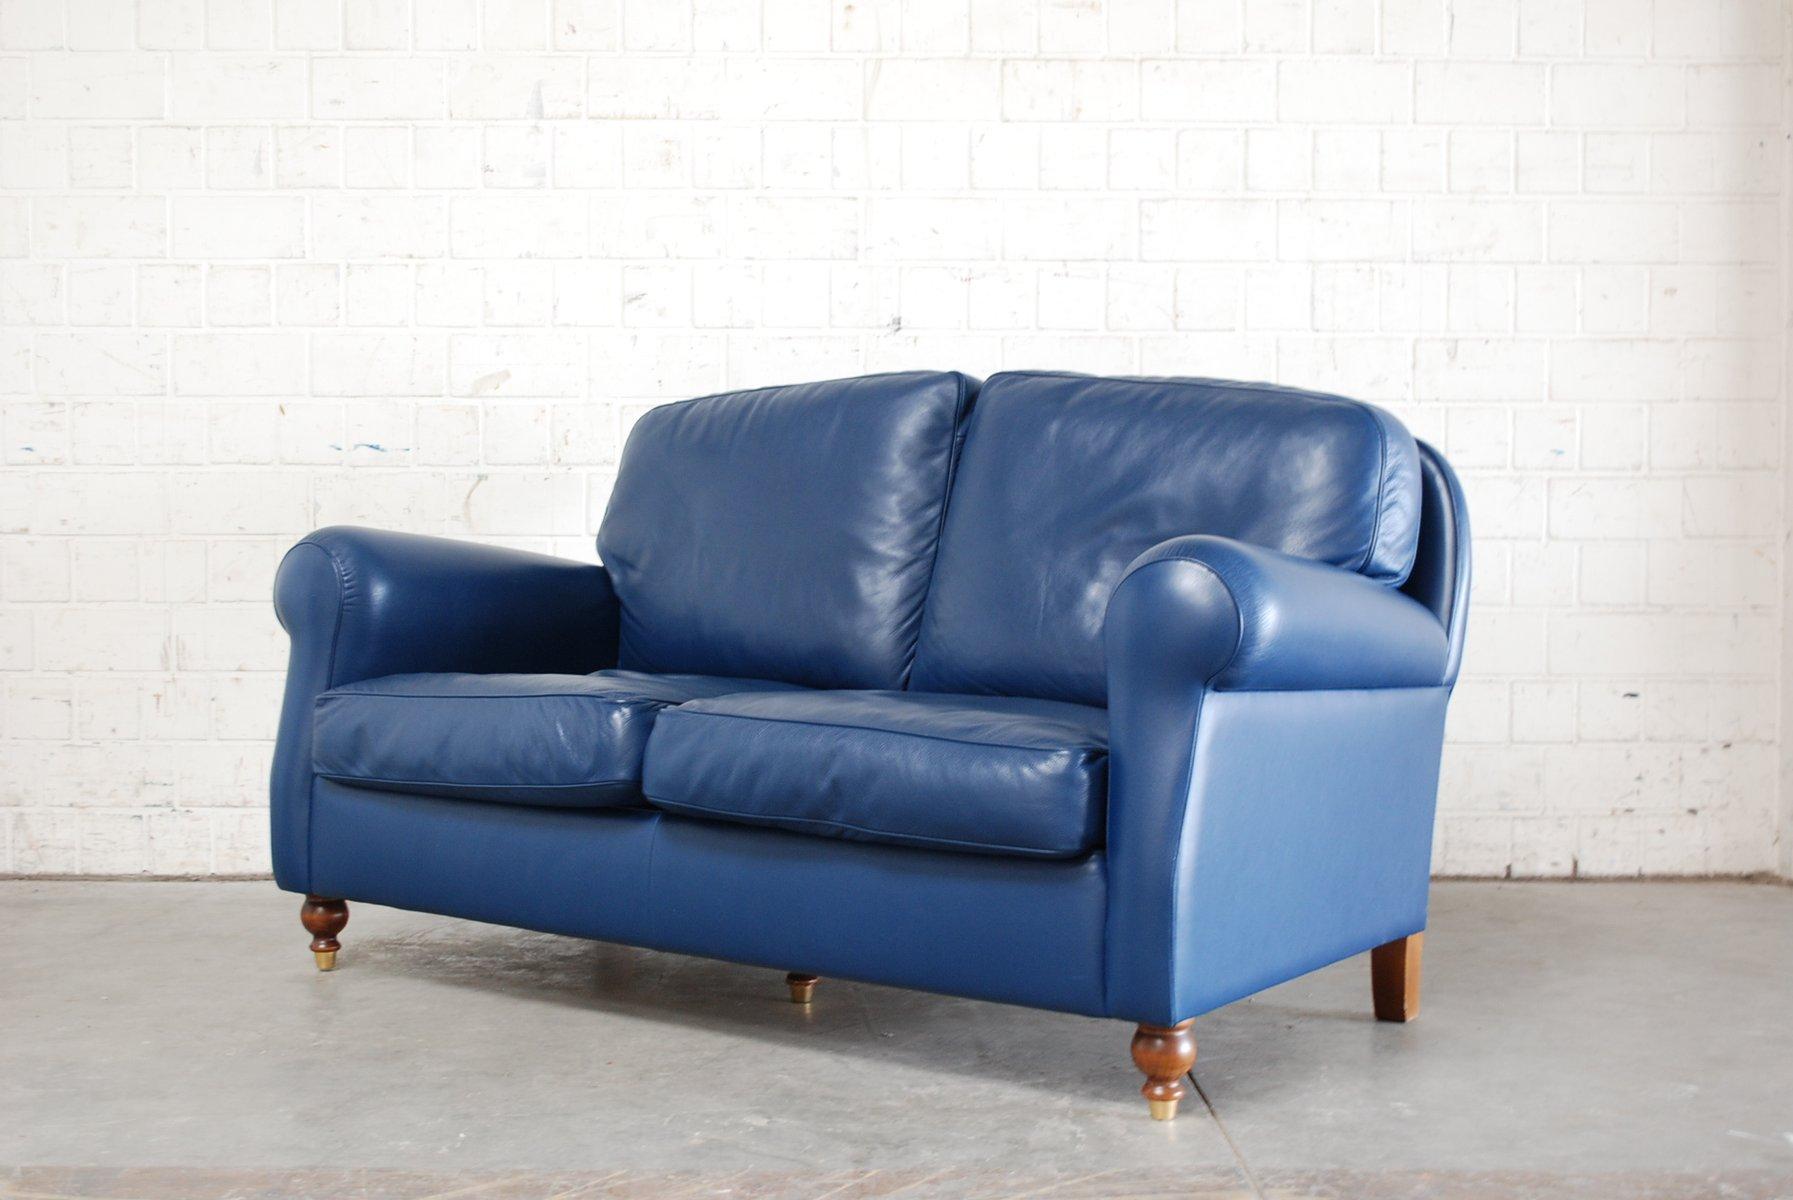 poltrona frau sofa review black covers australia george b italia project design by antonio